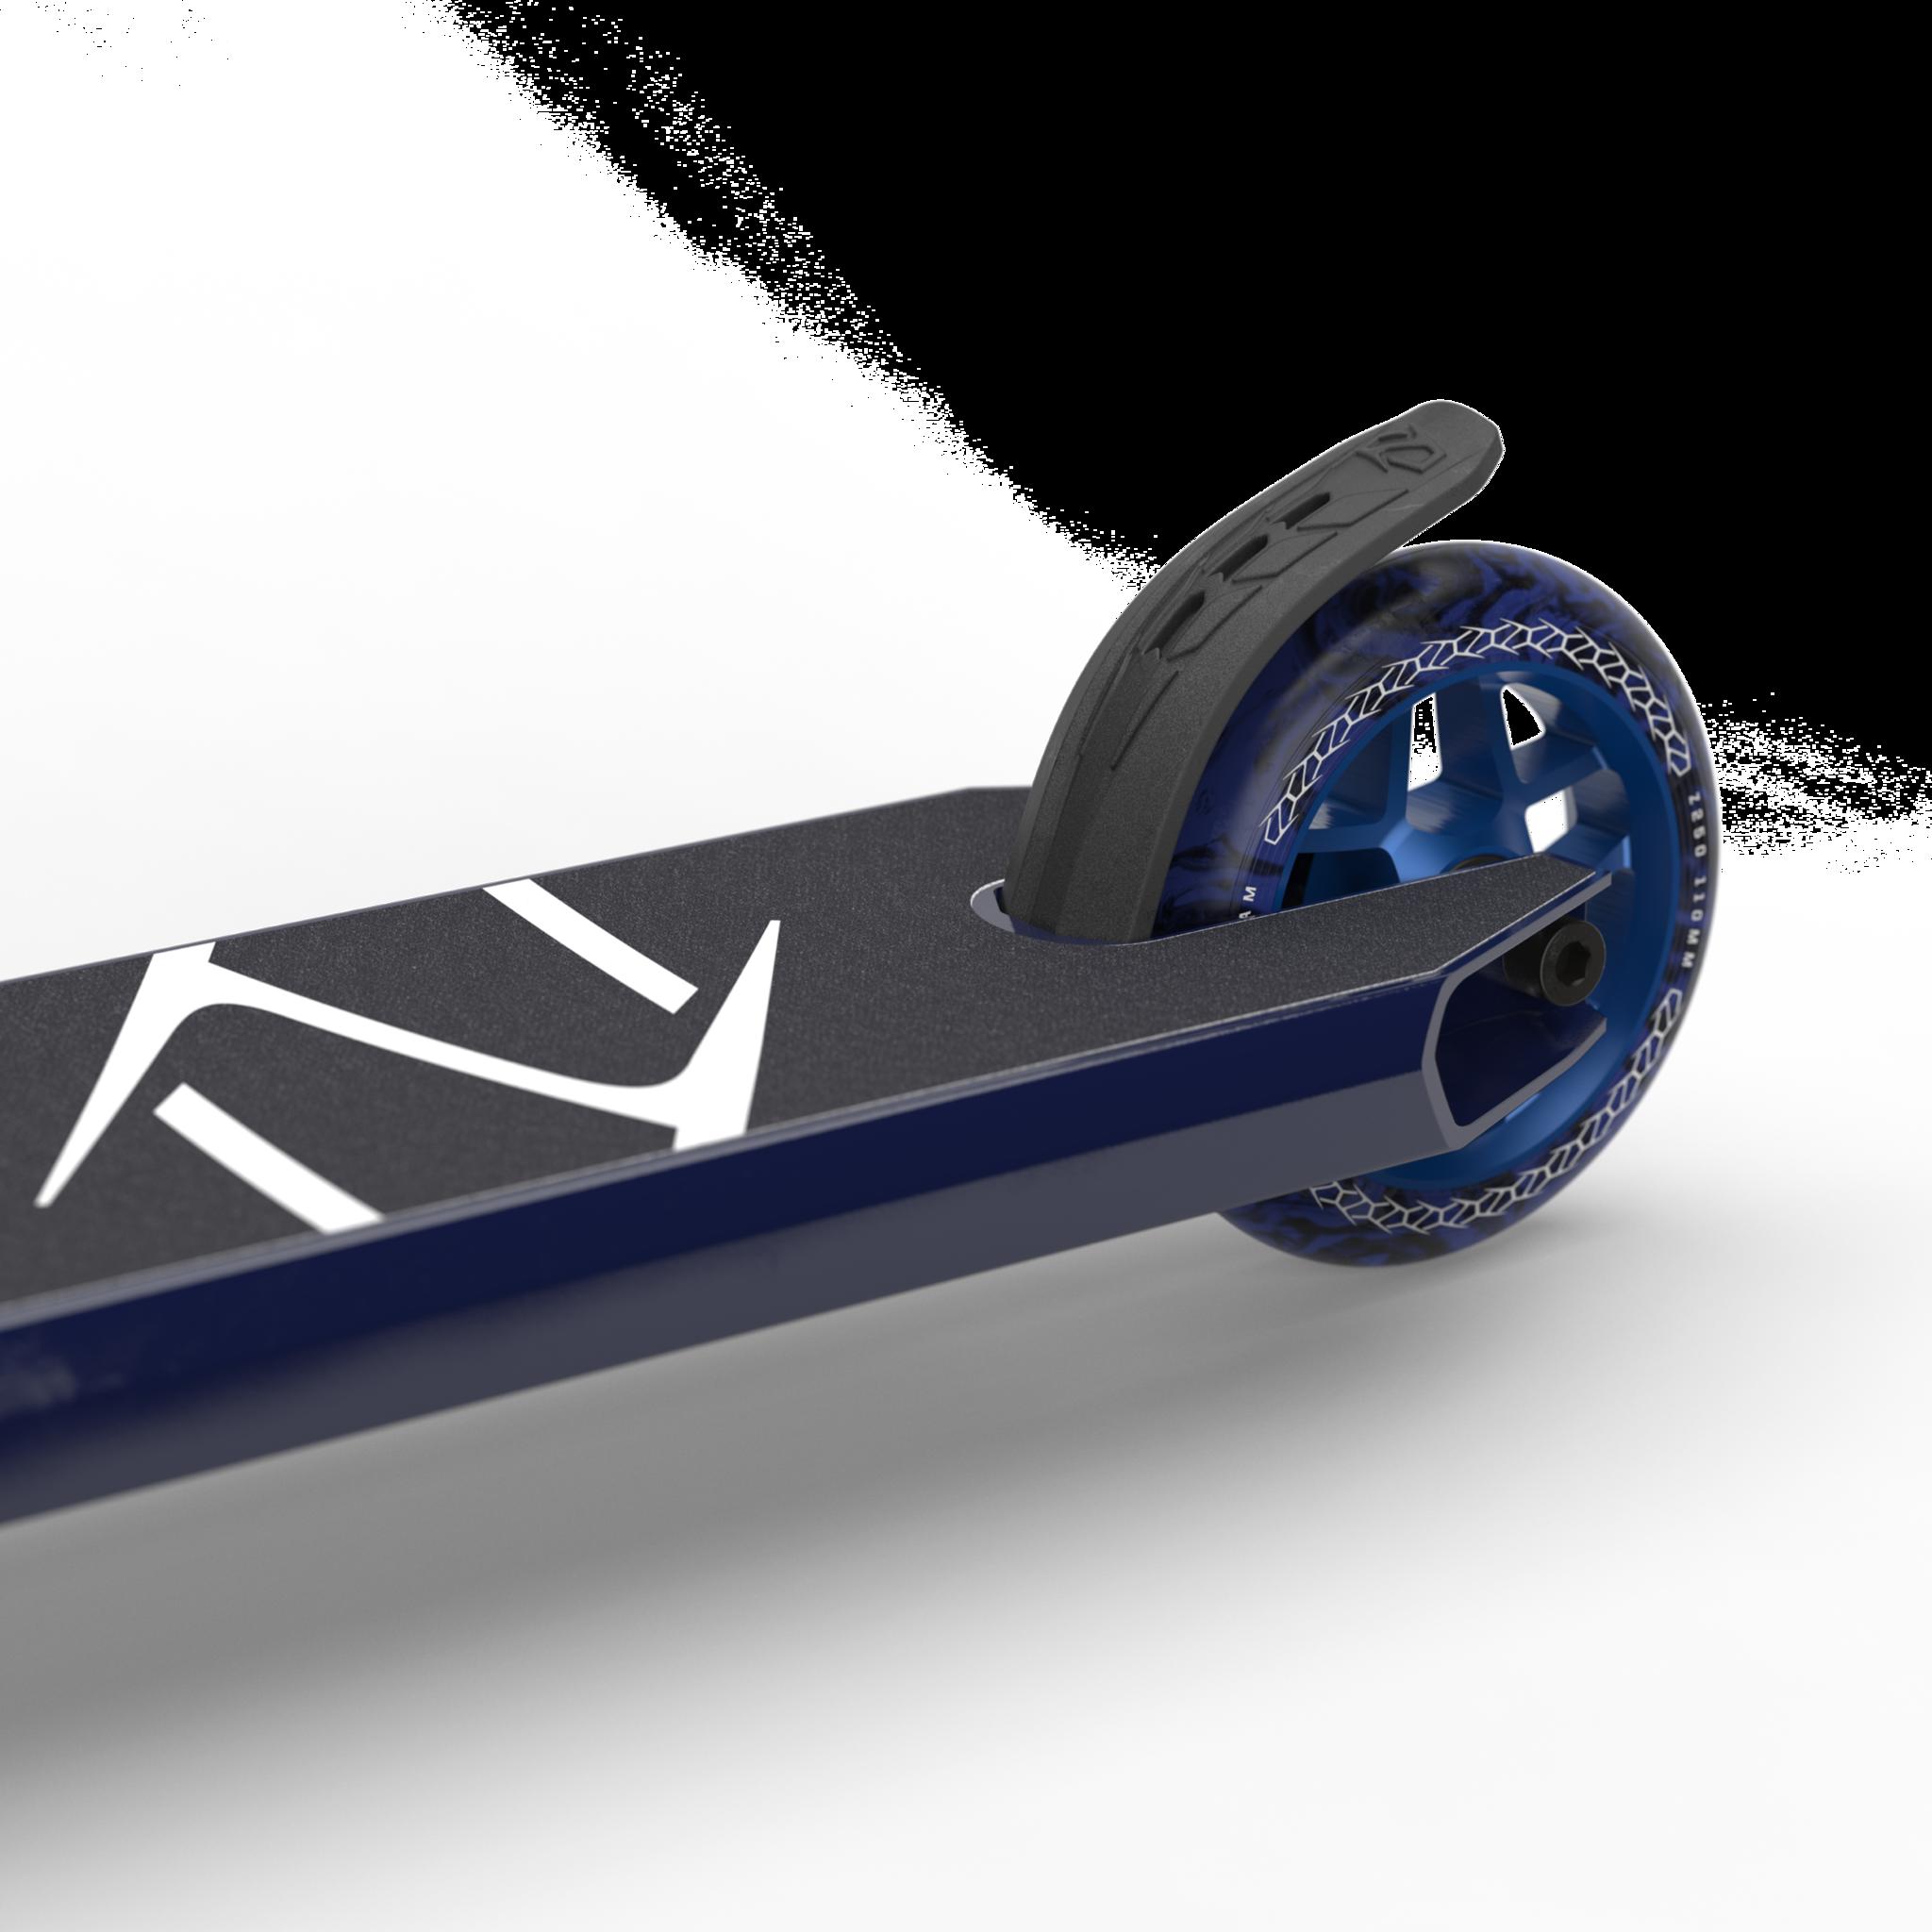 Трюковой самокат FUZION Z250 2021 (Blue)